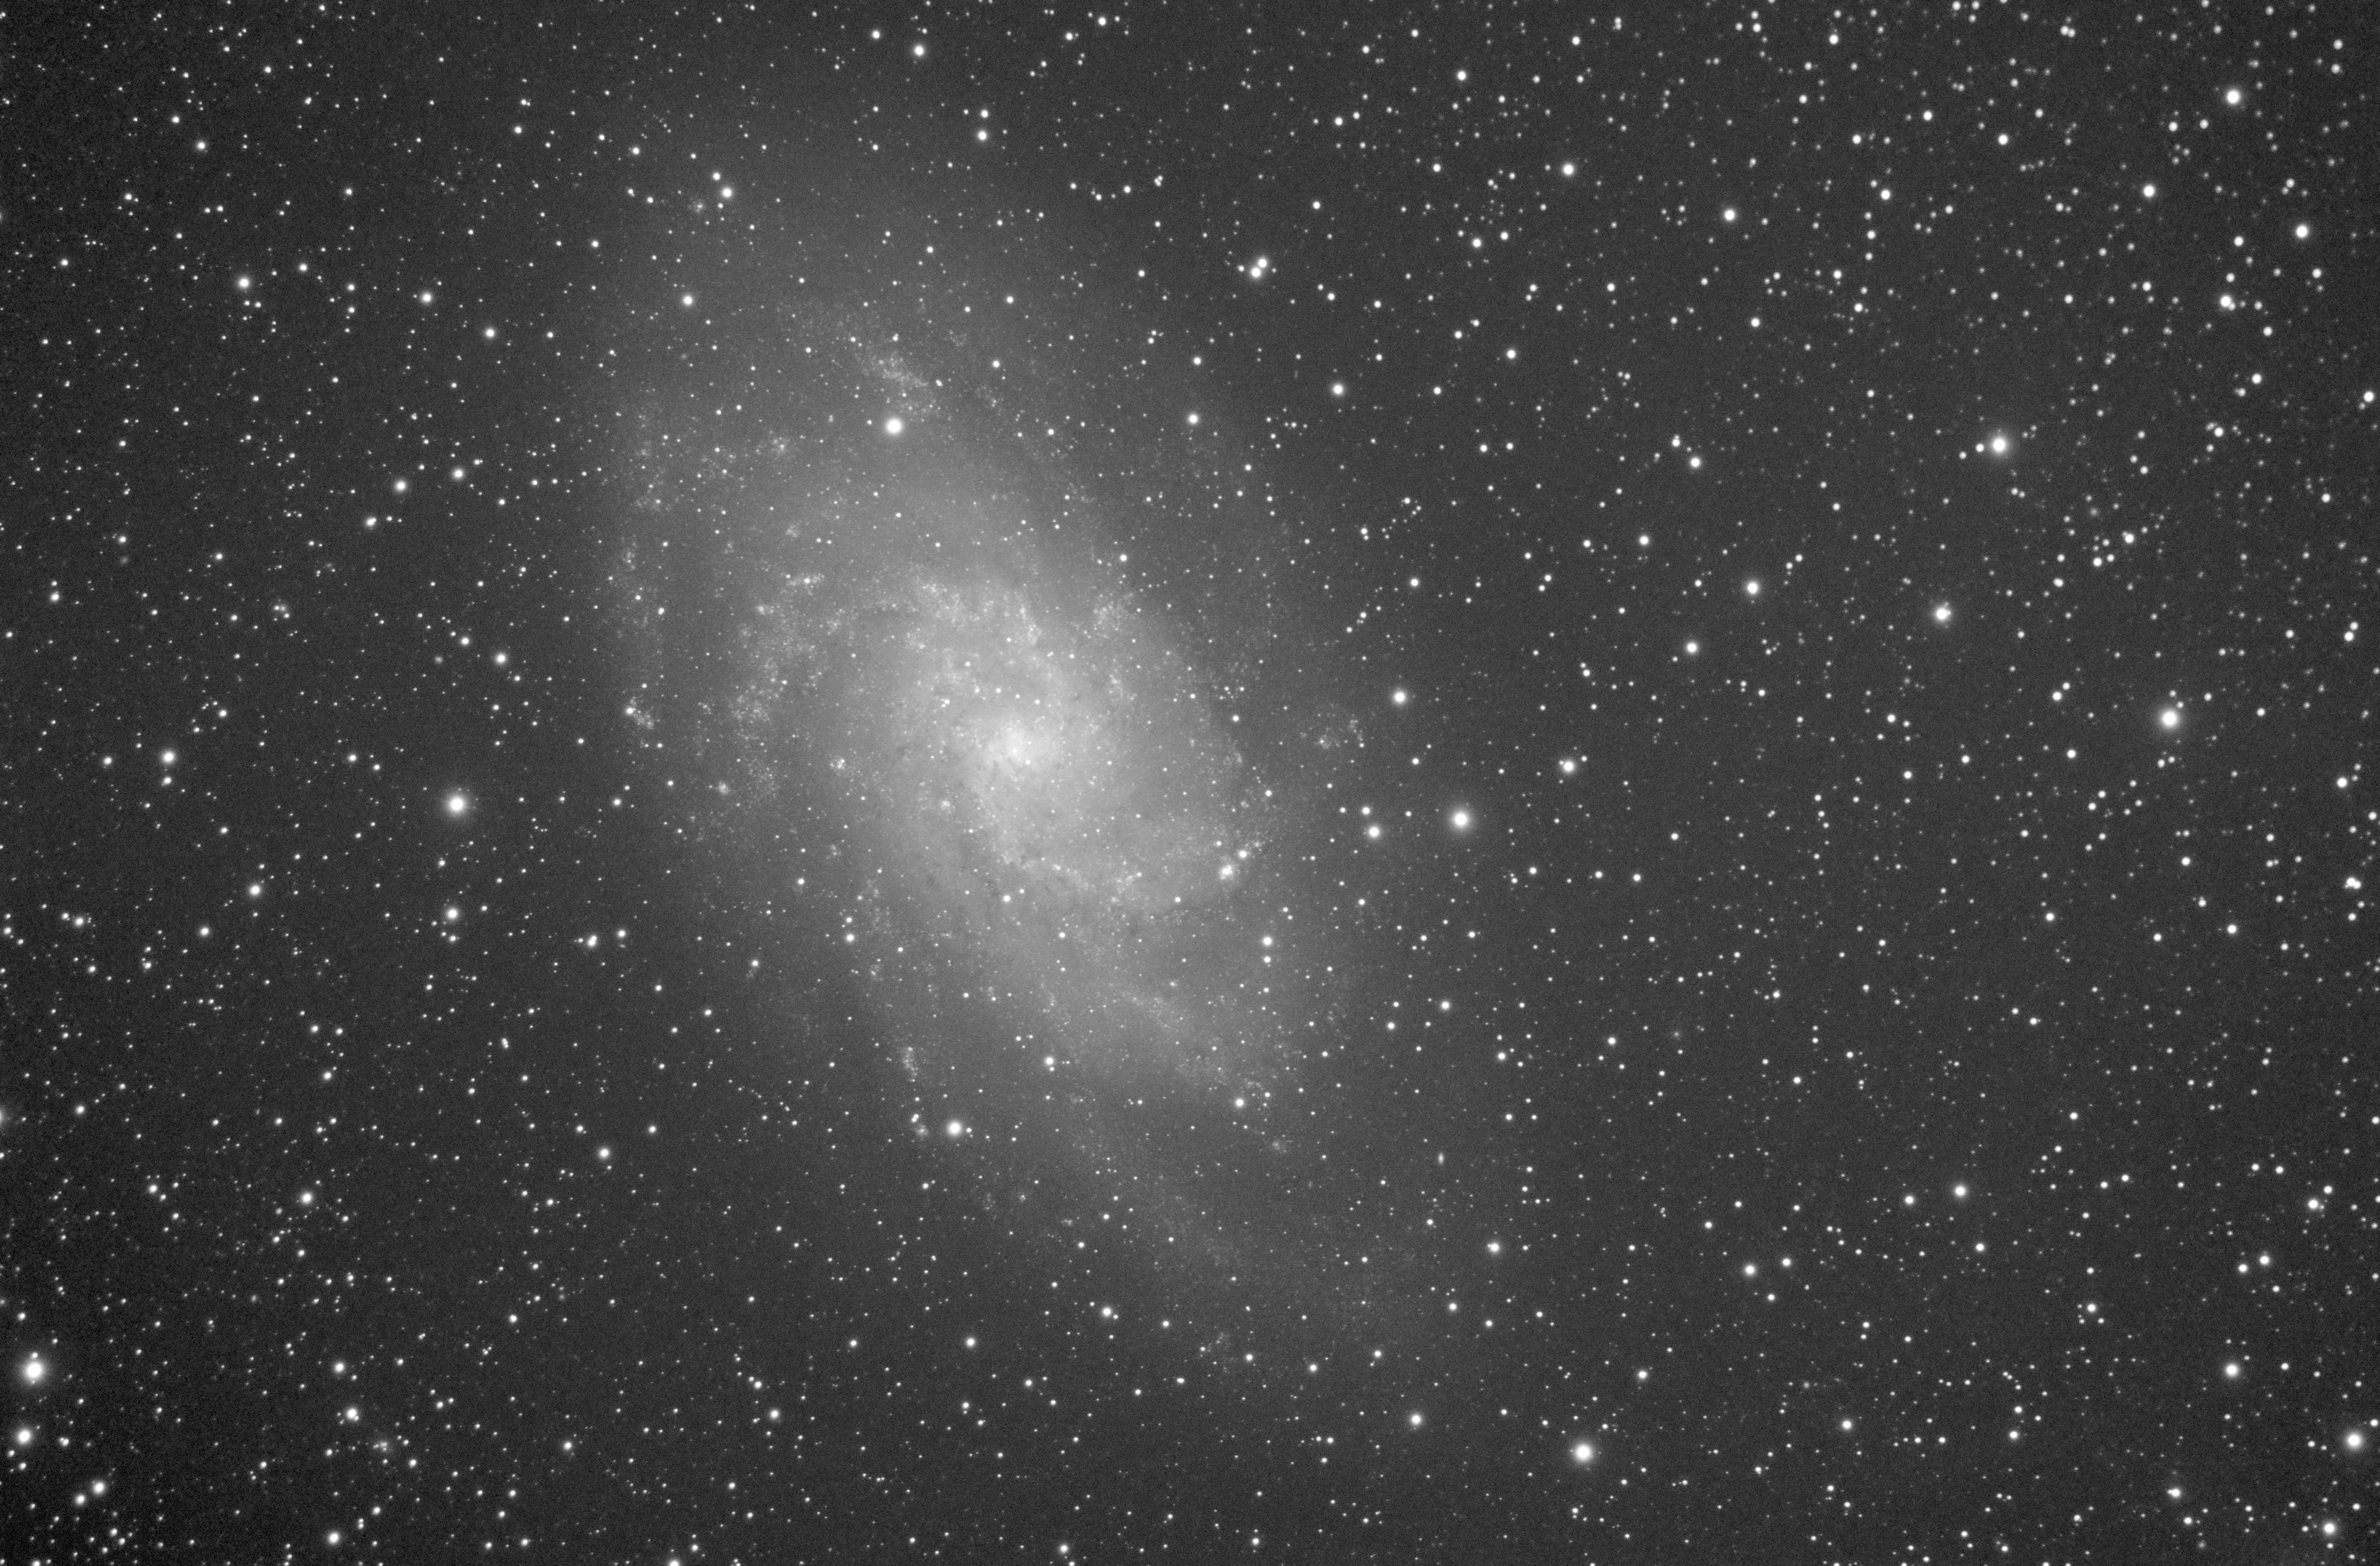 M33_24x90s_gain25.jpg